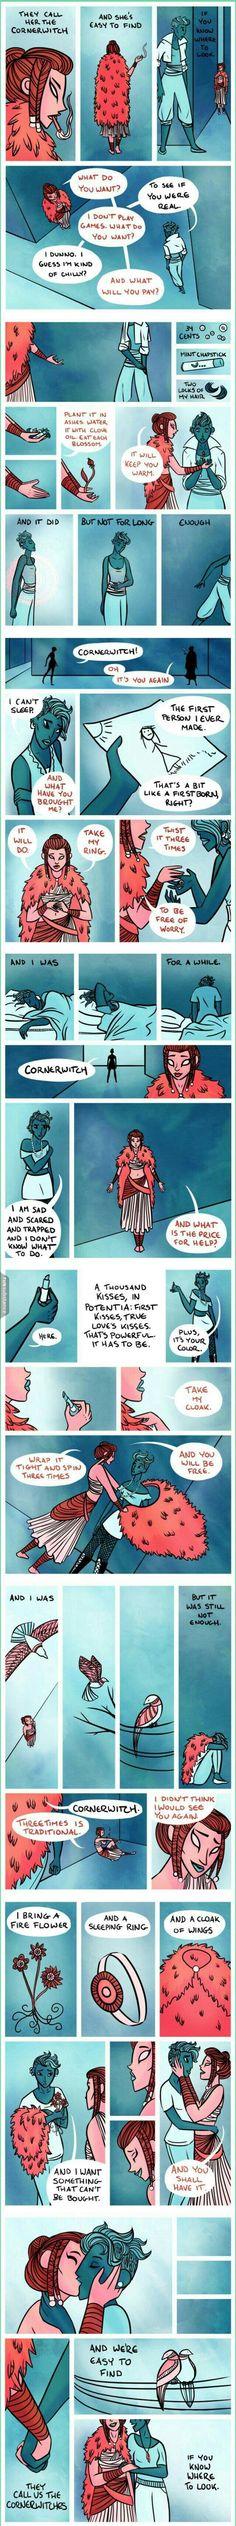 Cornerwitches comic strip